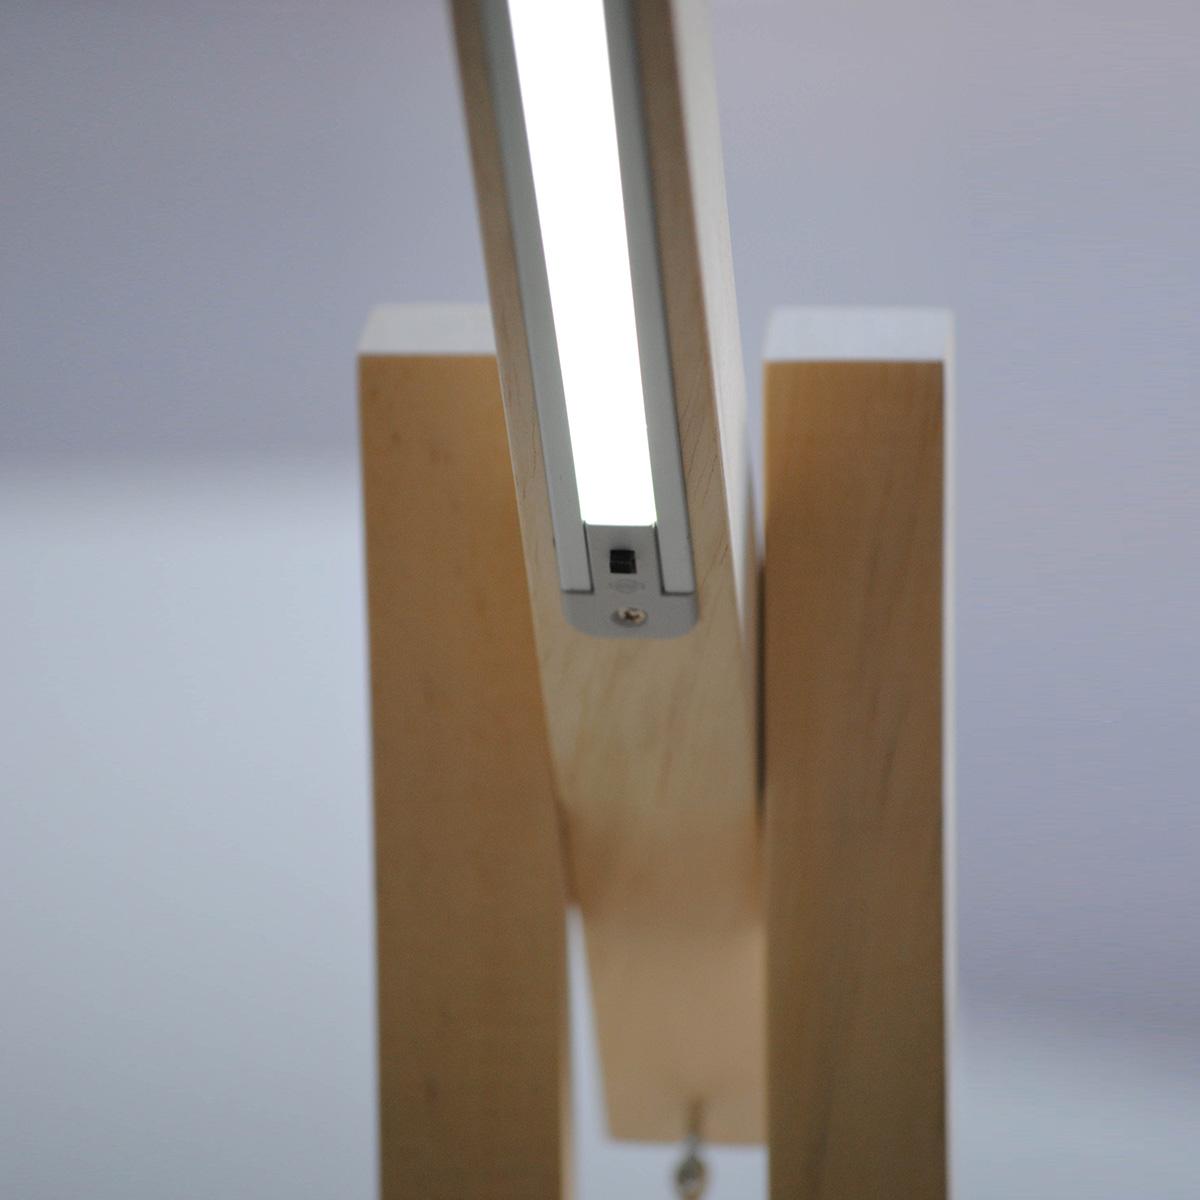 lampada-scrivaniza-led-leonardo-da-vinci-design